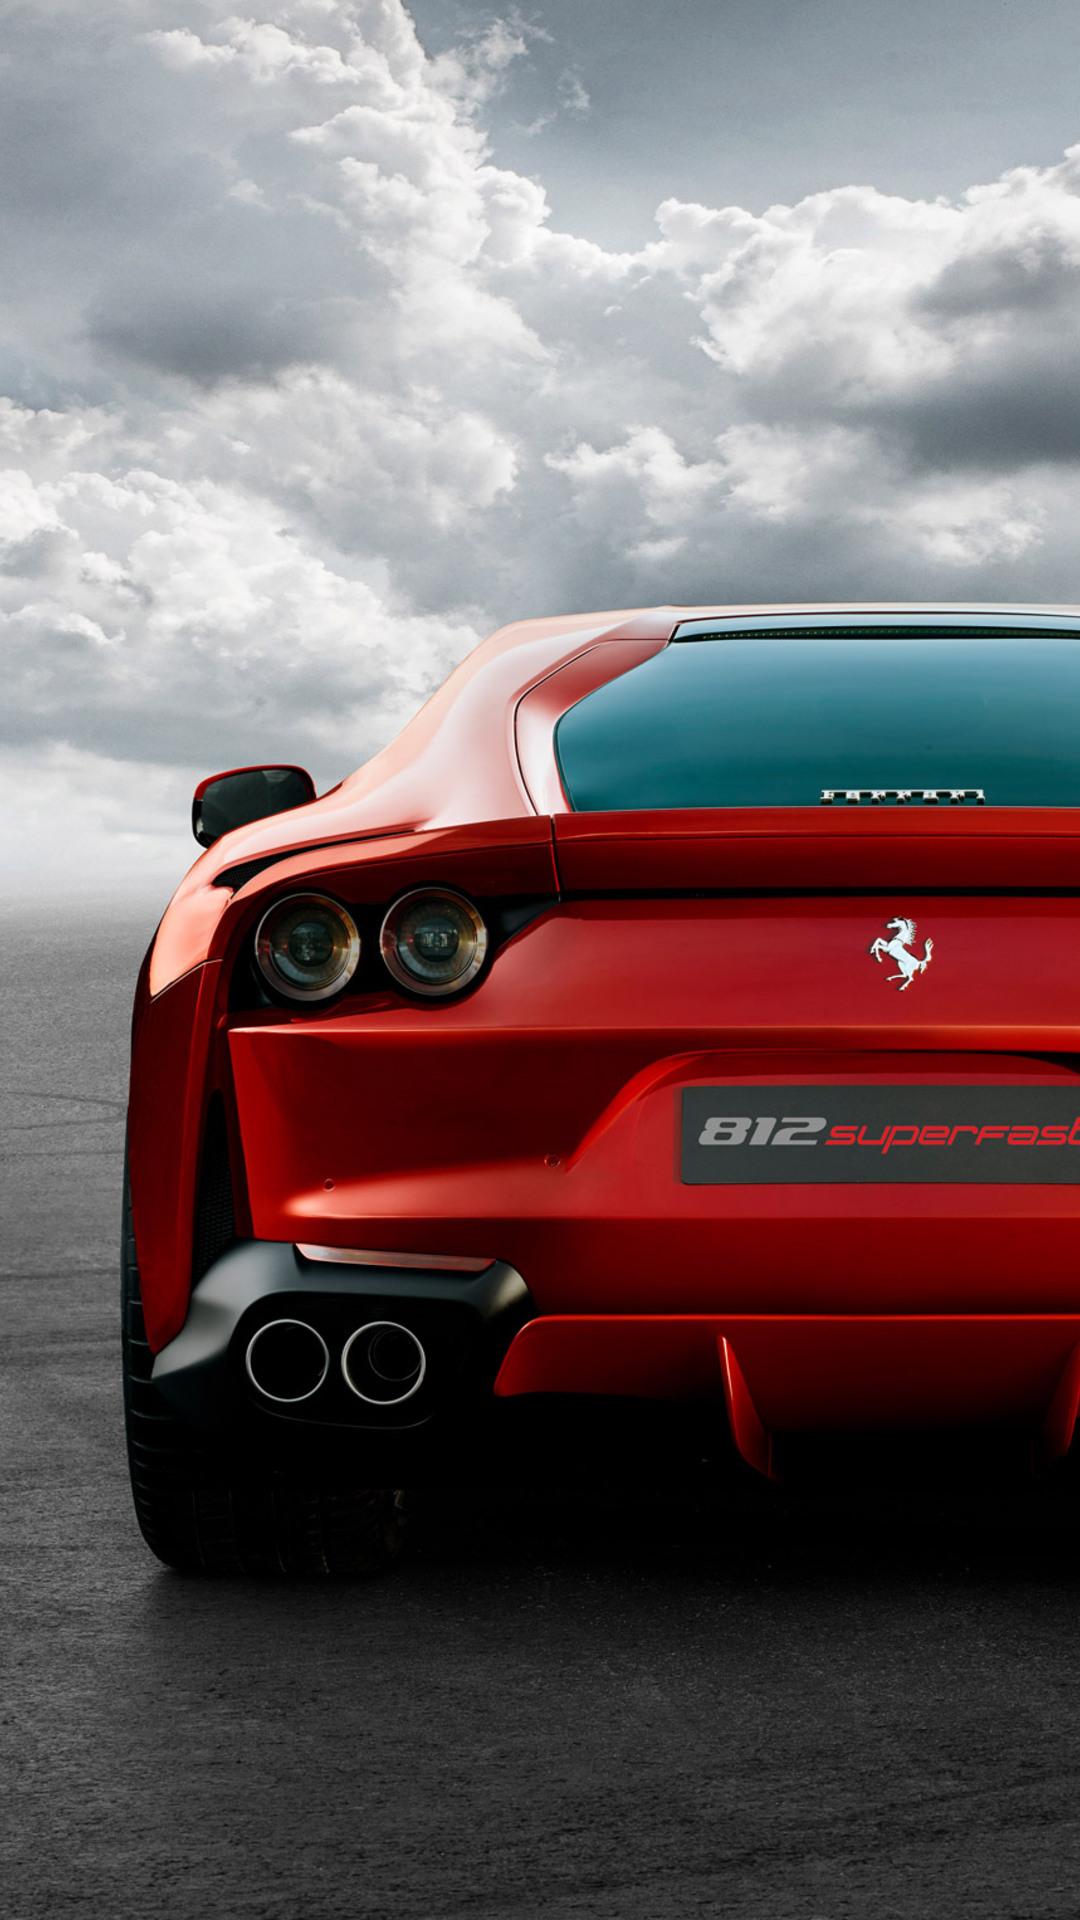 1080x1920 Ferrari 812 Superfast Rear Iphone 7,6s,6 Plus ...